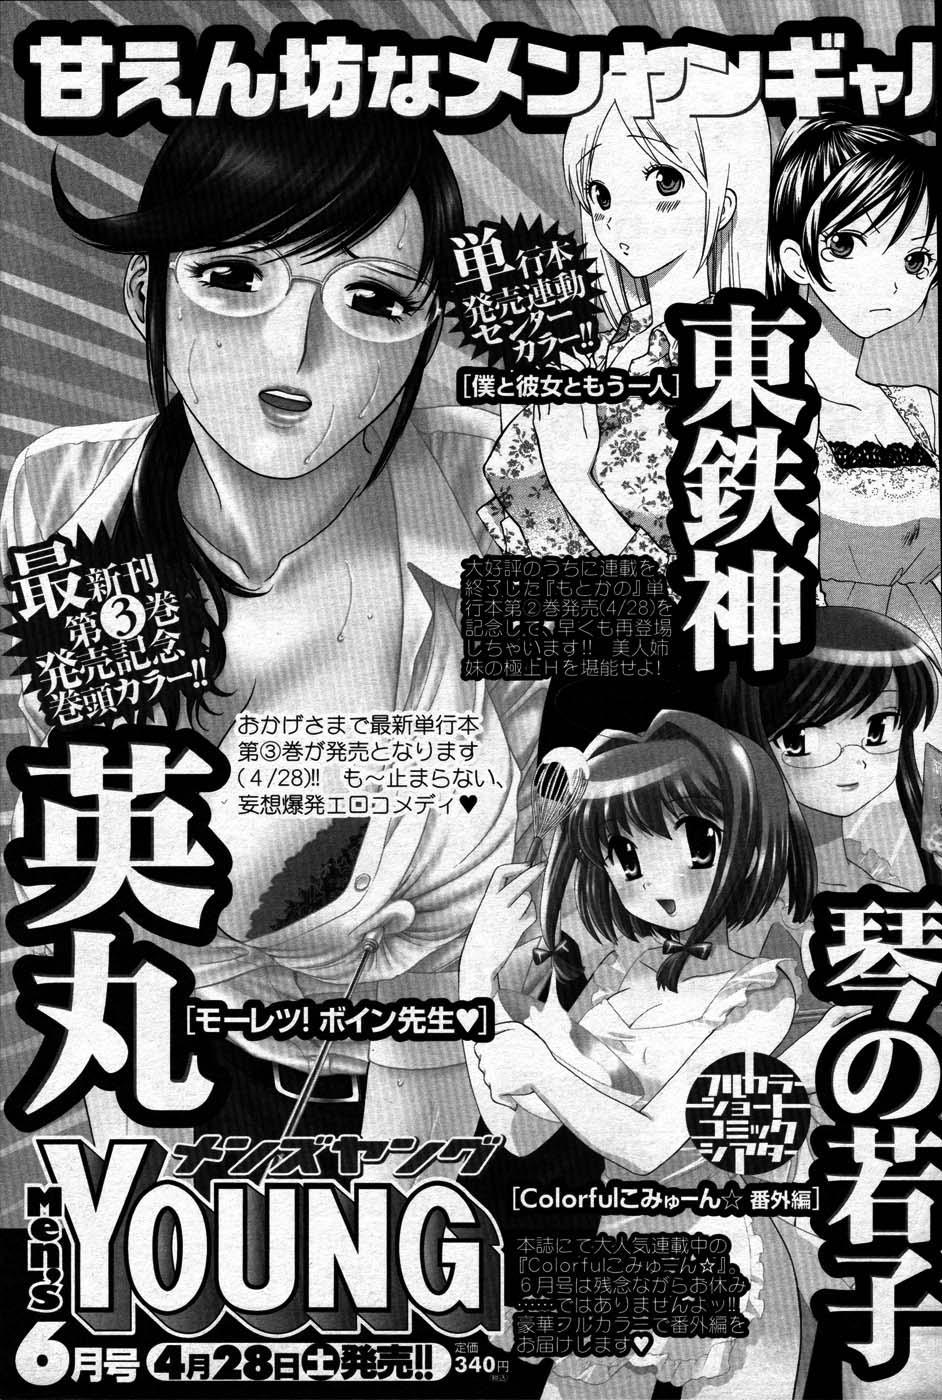 Comic Mens Young Special IKAZUCHI vol. 2 242